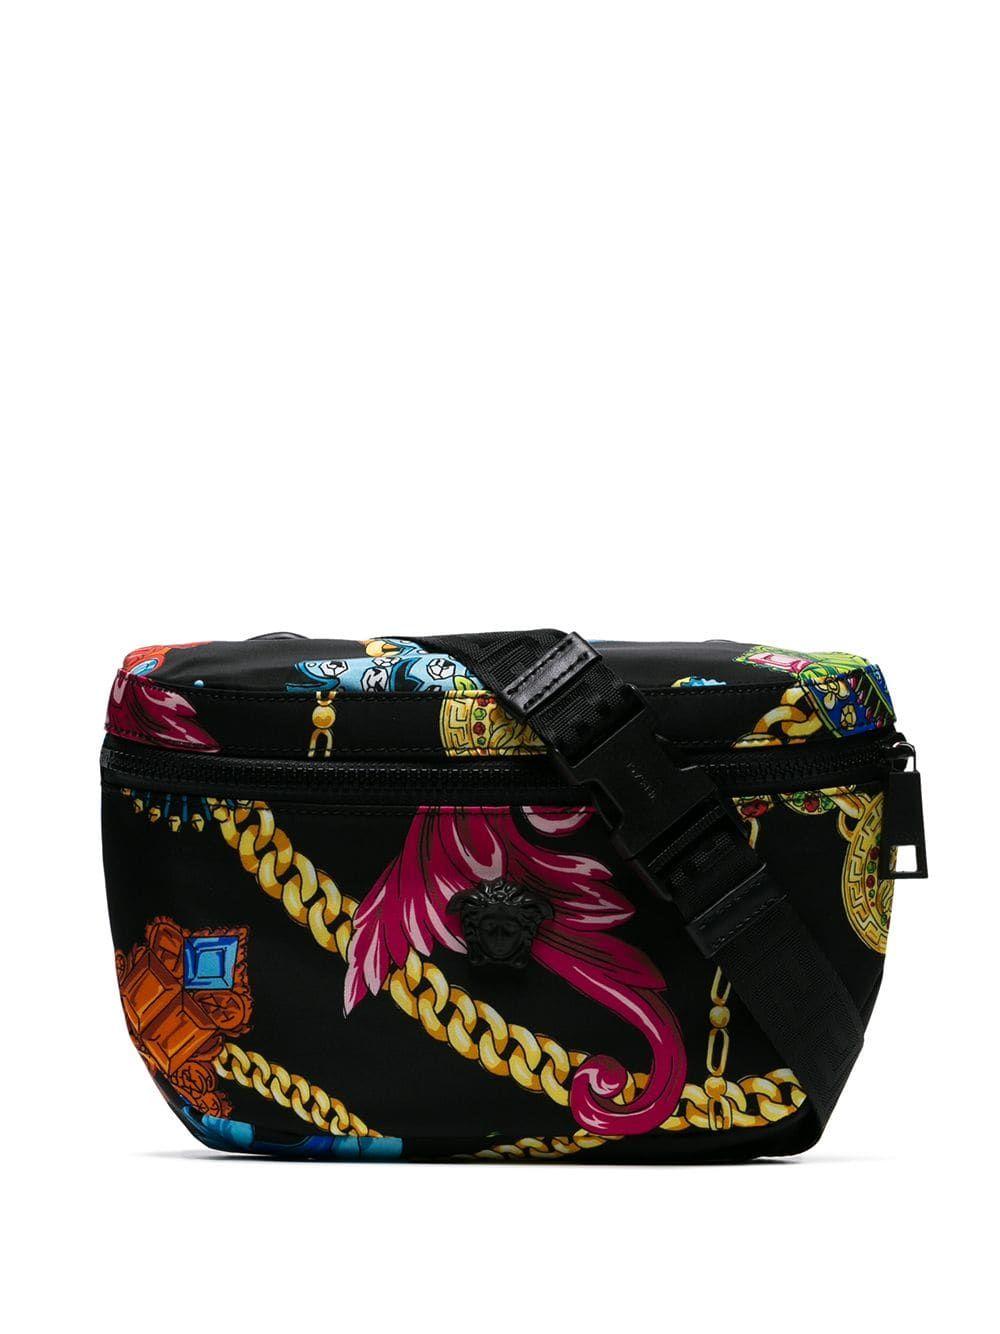 91fba2a63 VERSACE VERSACE JEWELLERY PRINT BELT BAG - MULTICOLOURED. #versace #bags  #belt bags